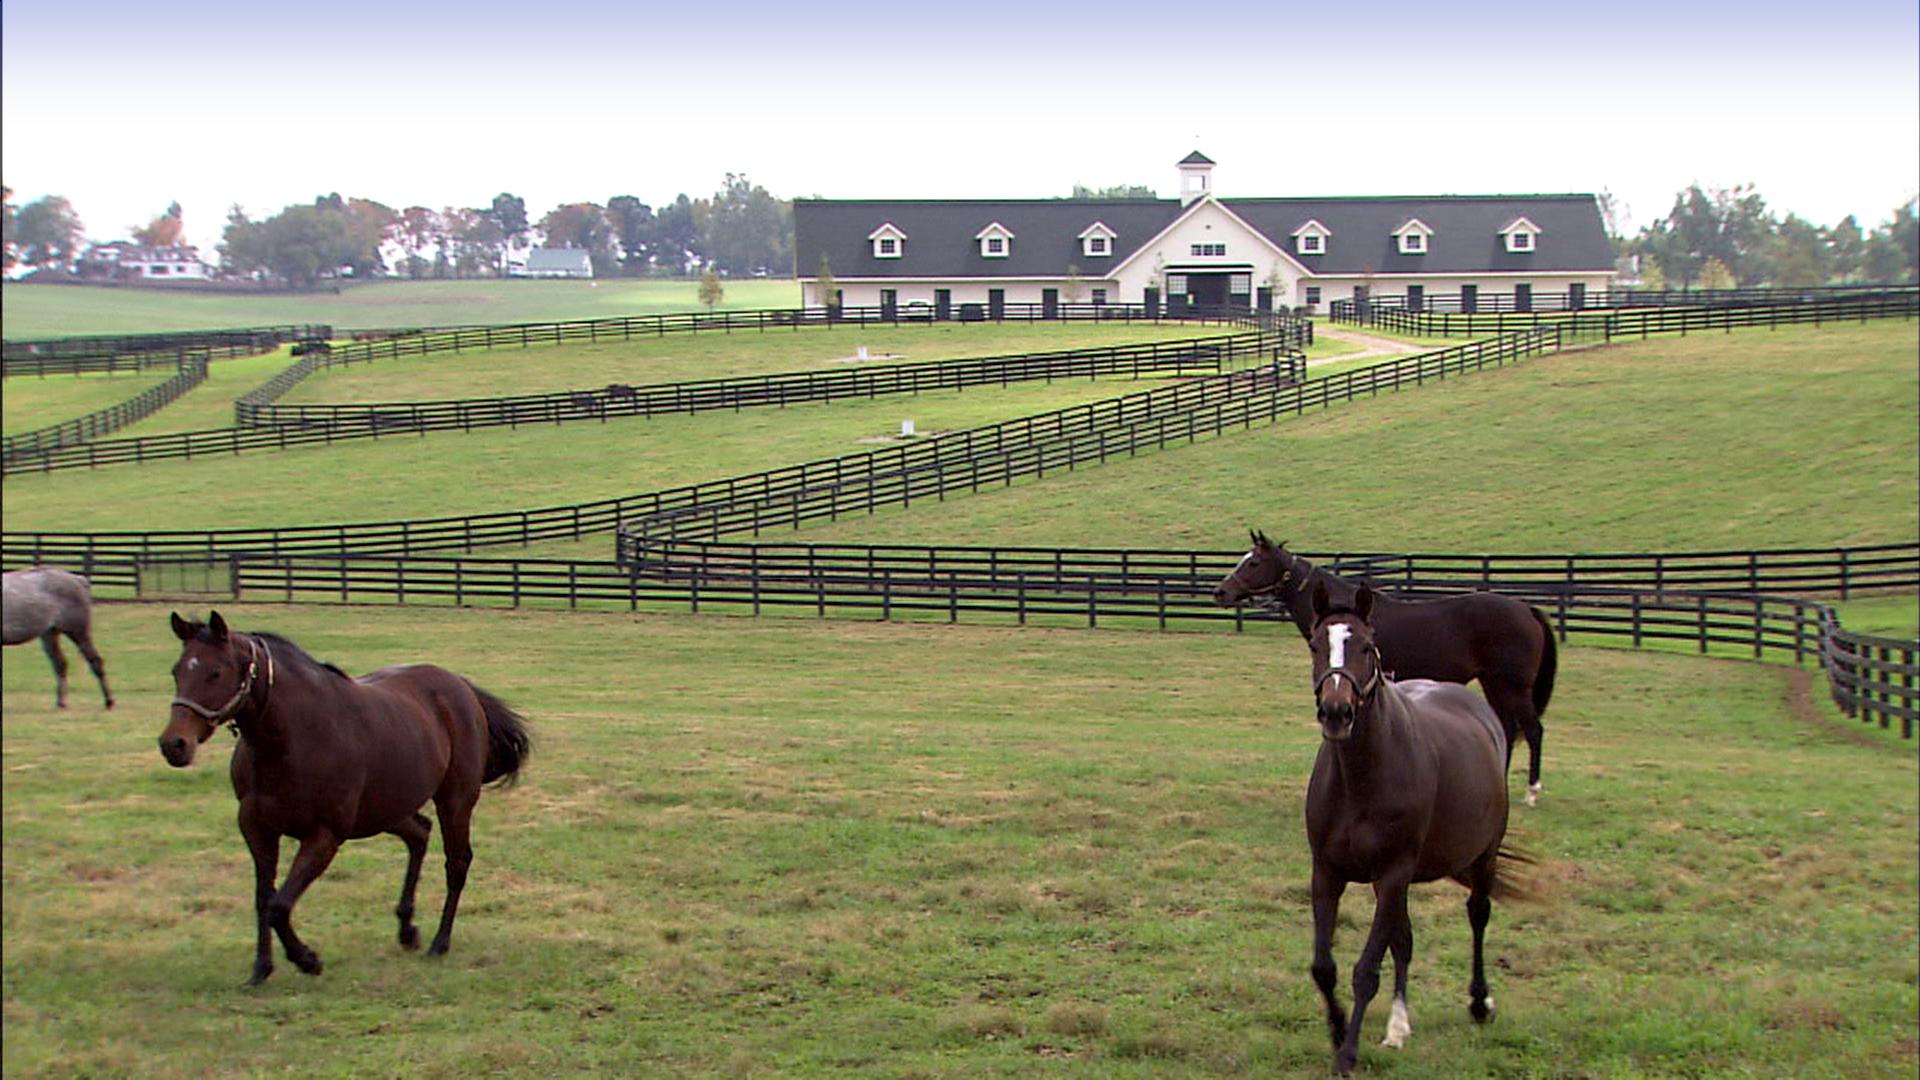 Horse farm images reverse search for Horse farm